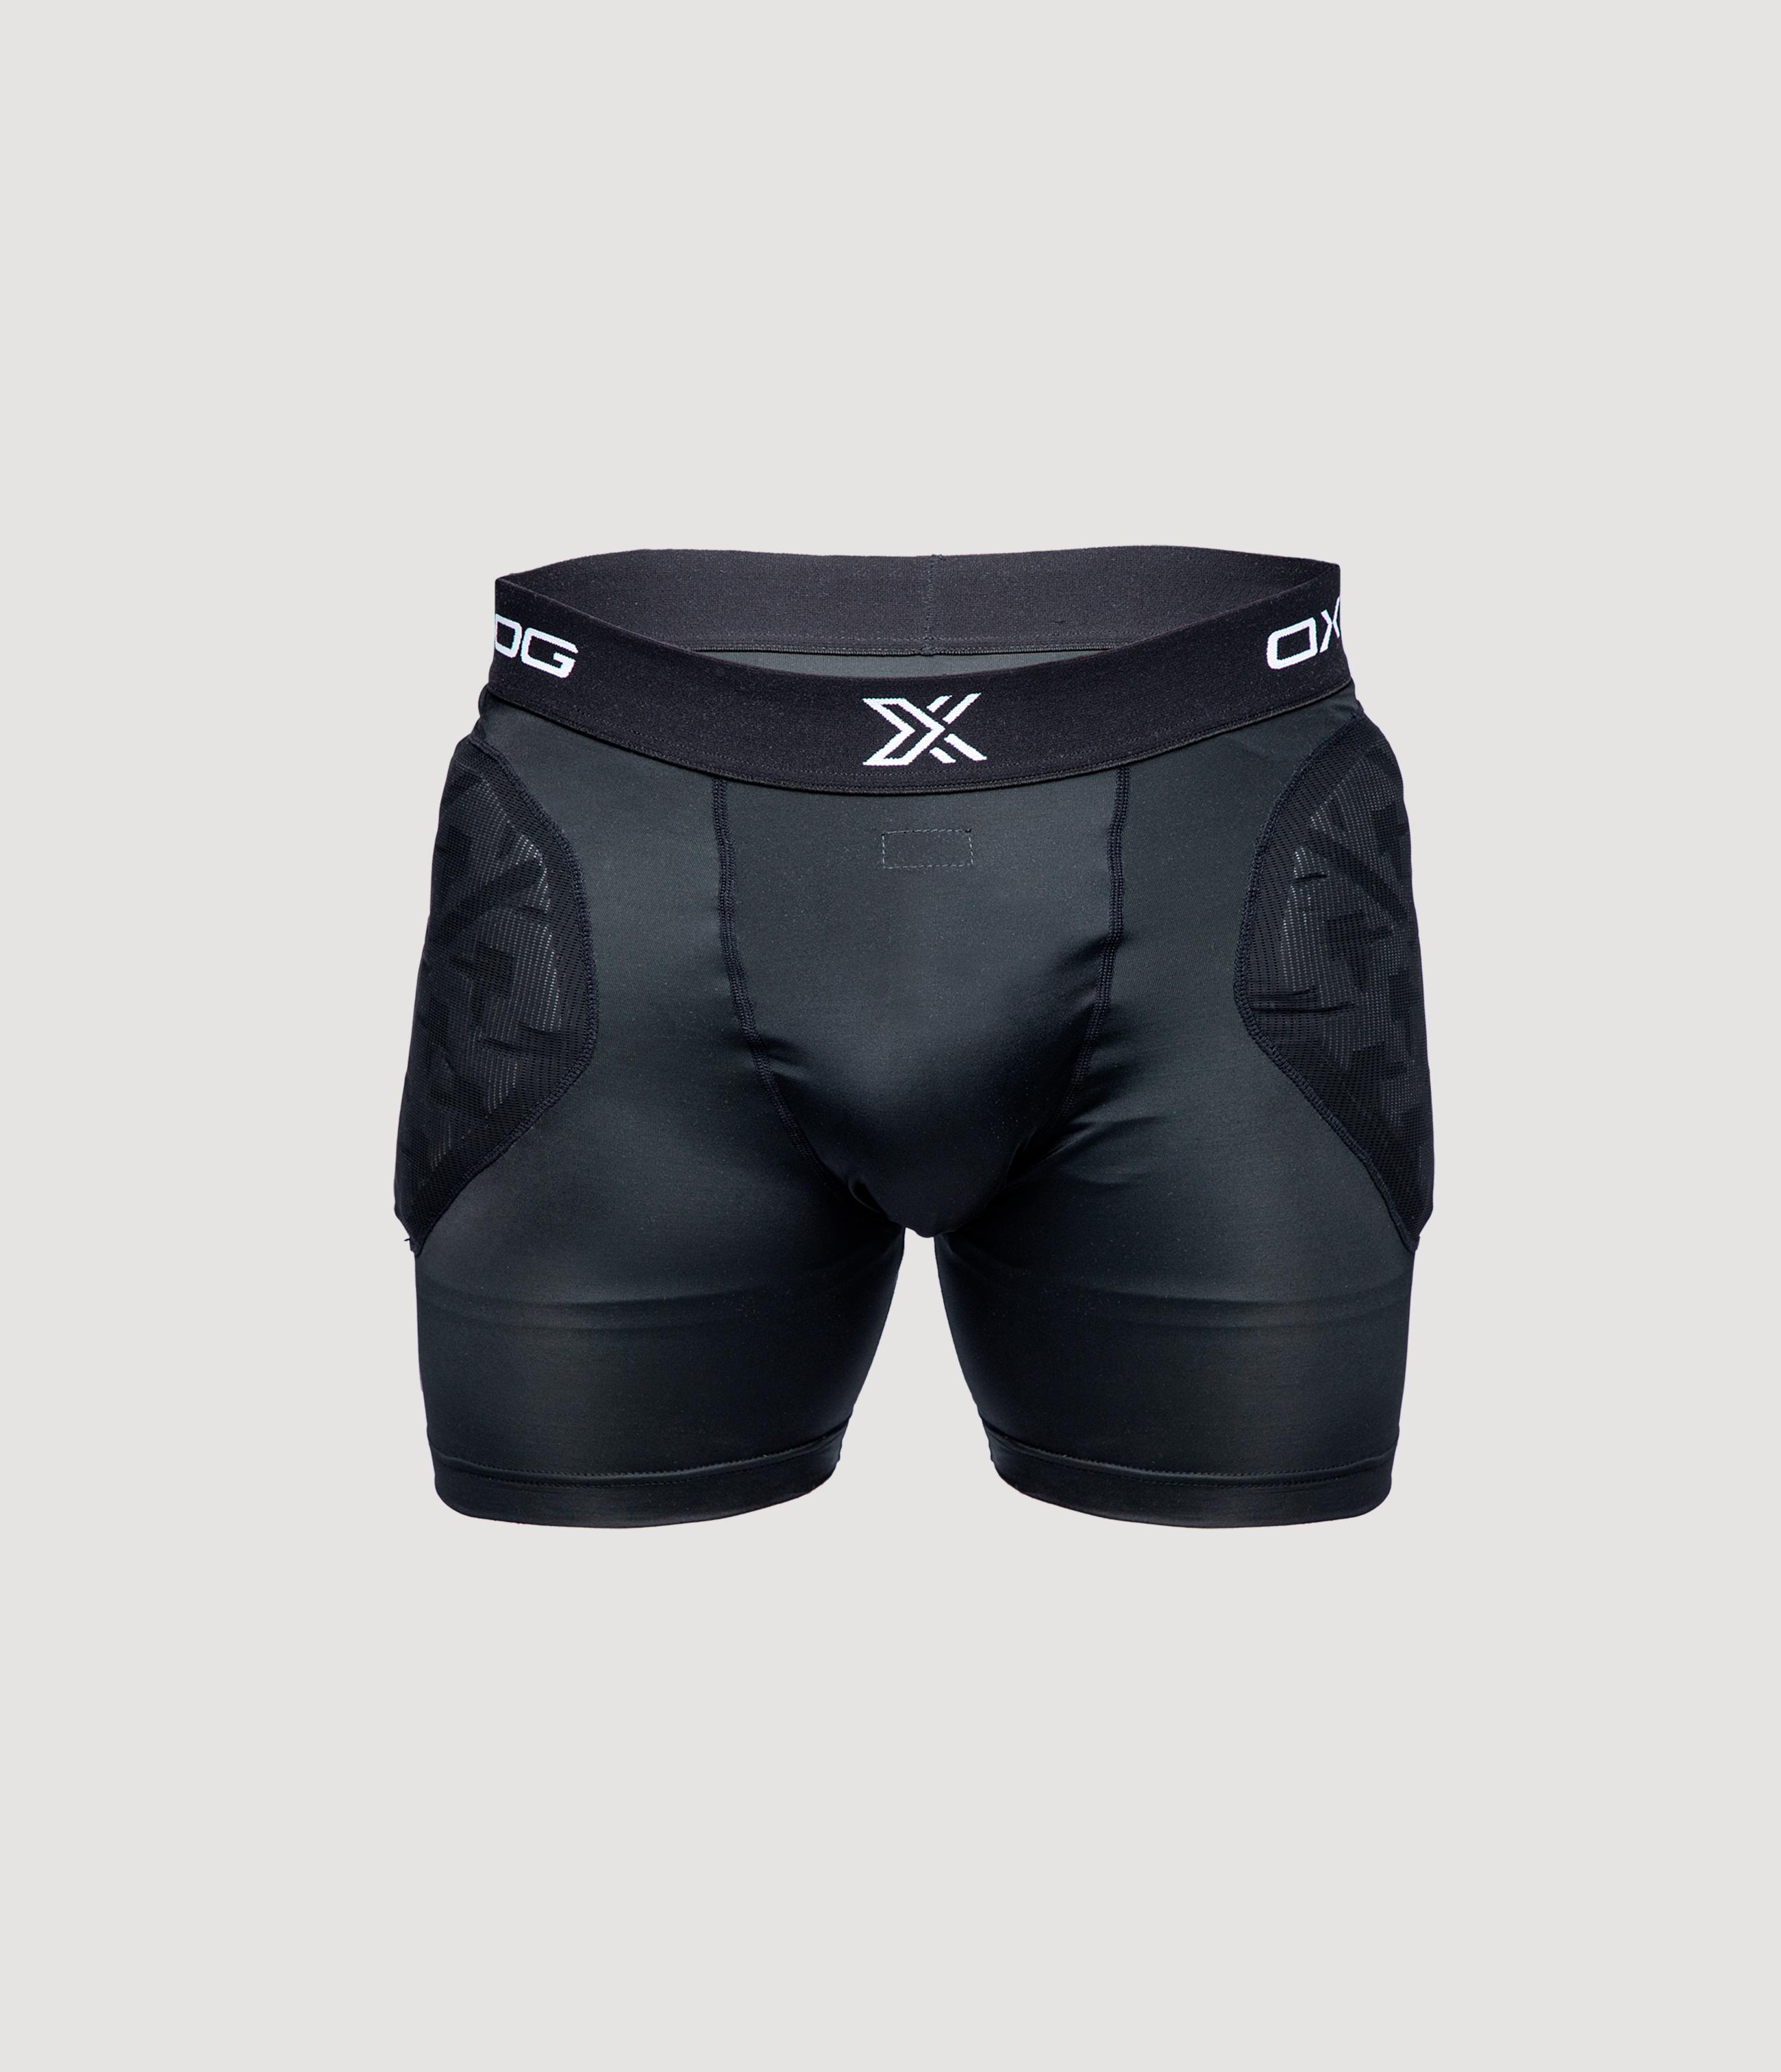 XGuard Protection Shorts Front